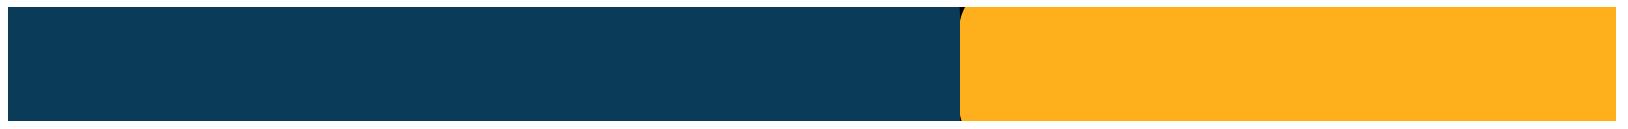 Headstart FInancial Client Logo San Francisco